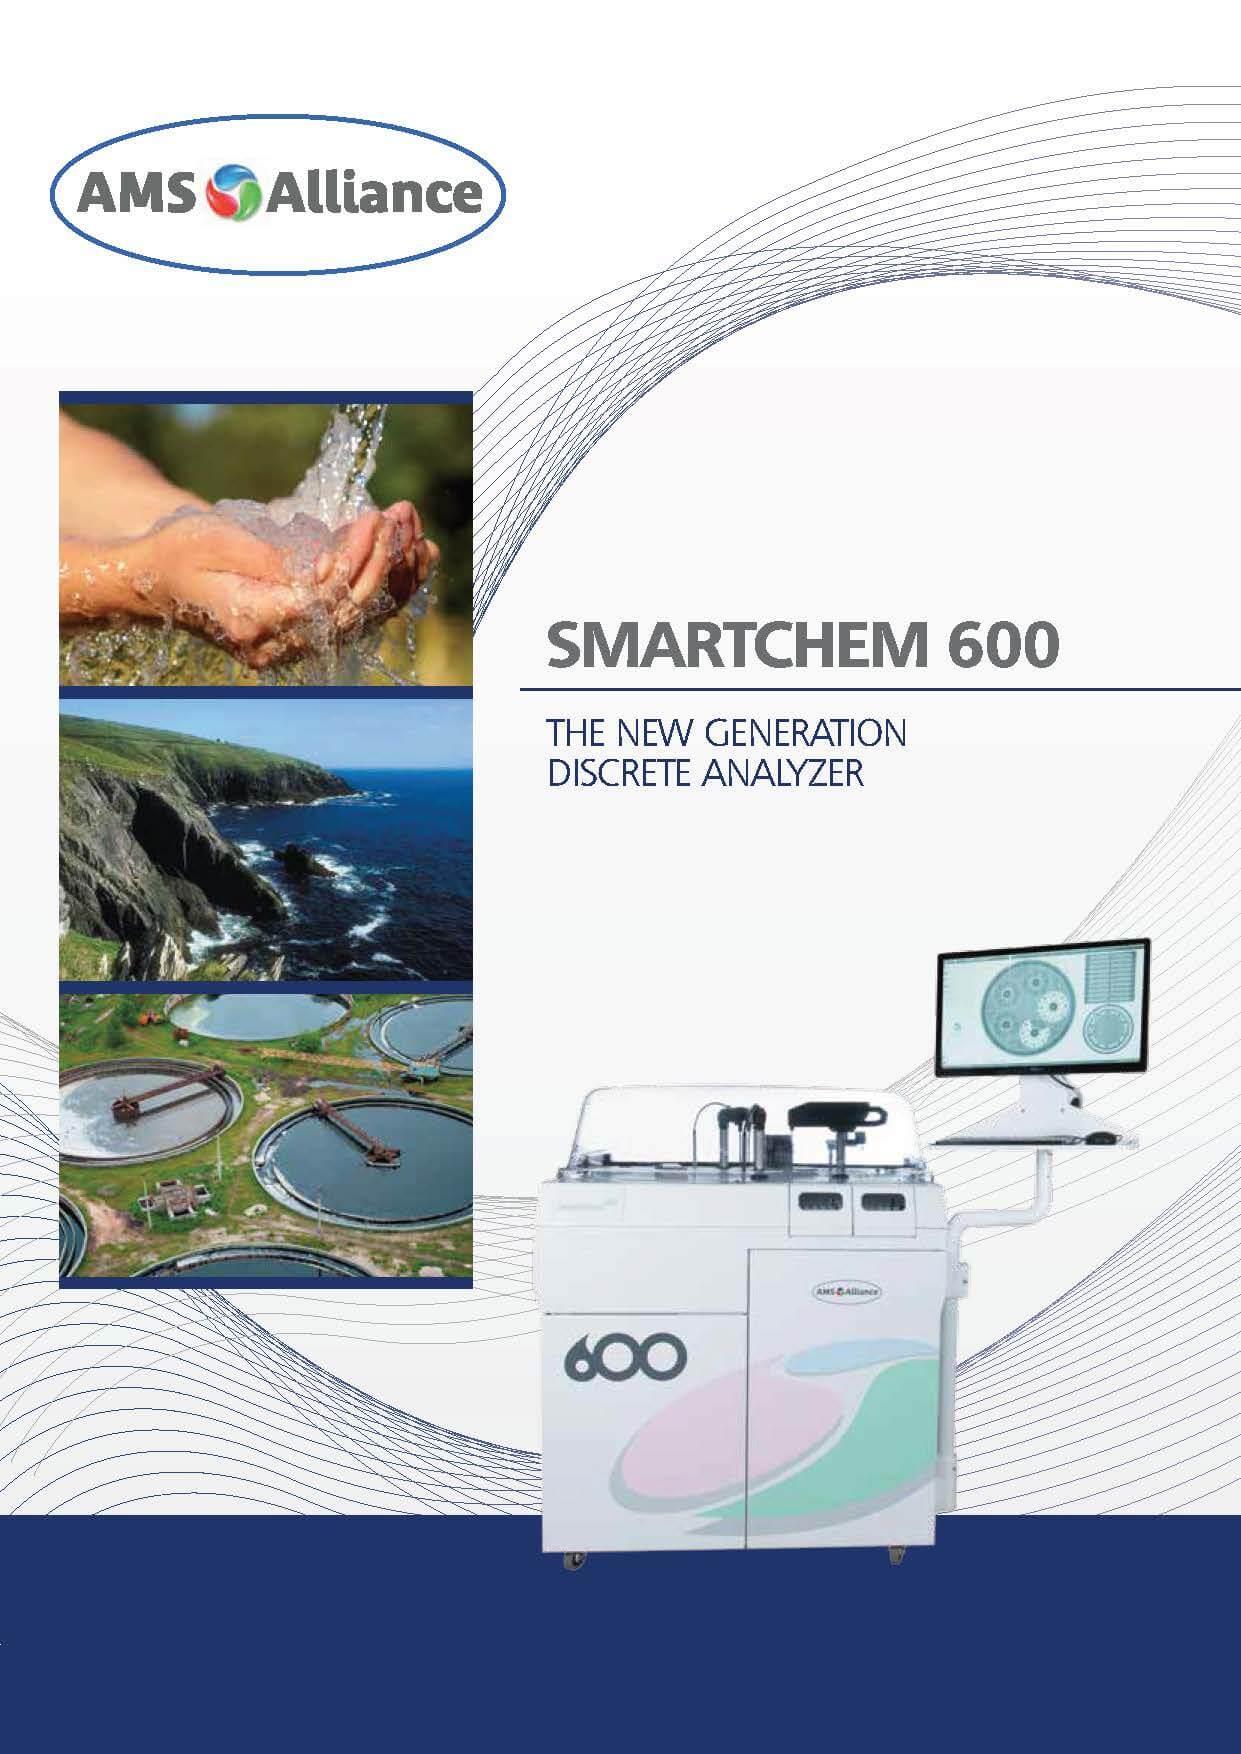 Smartchem 600